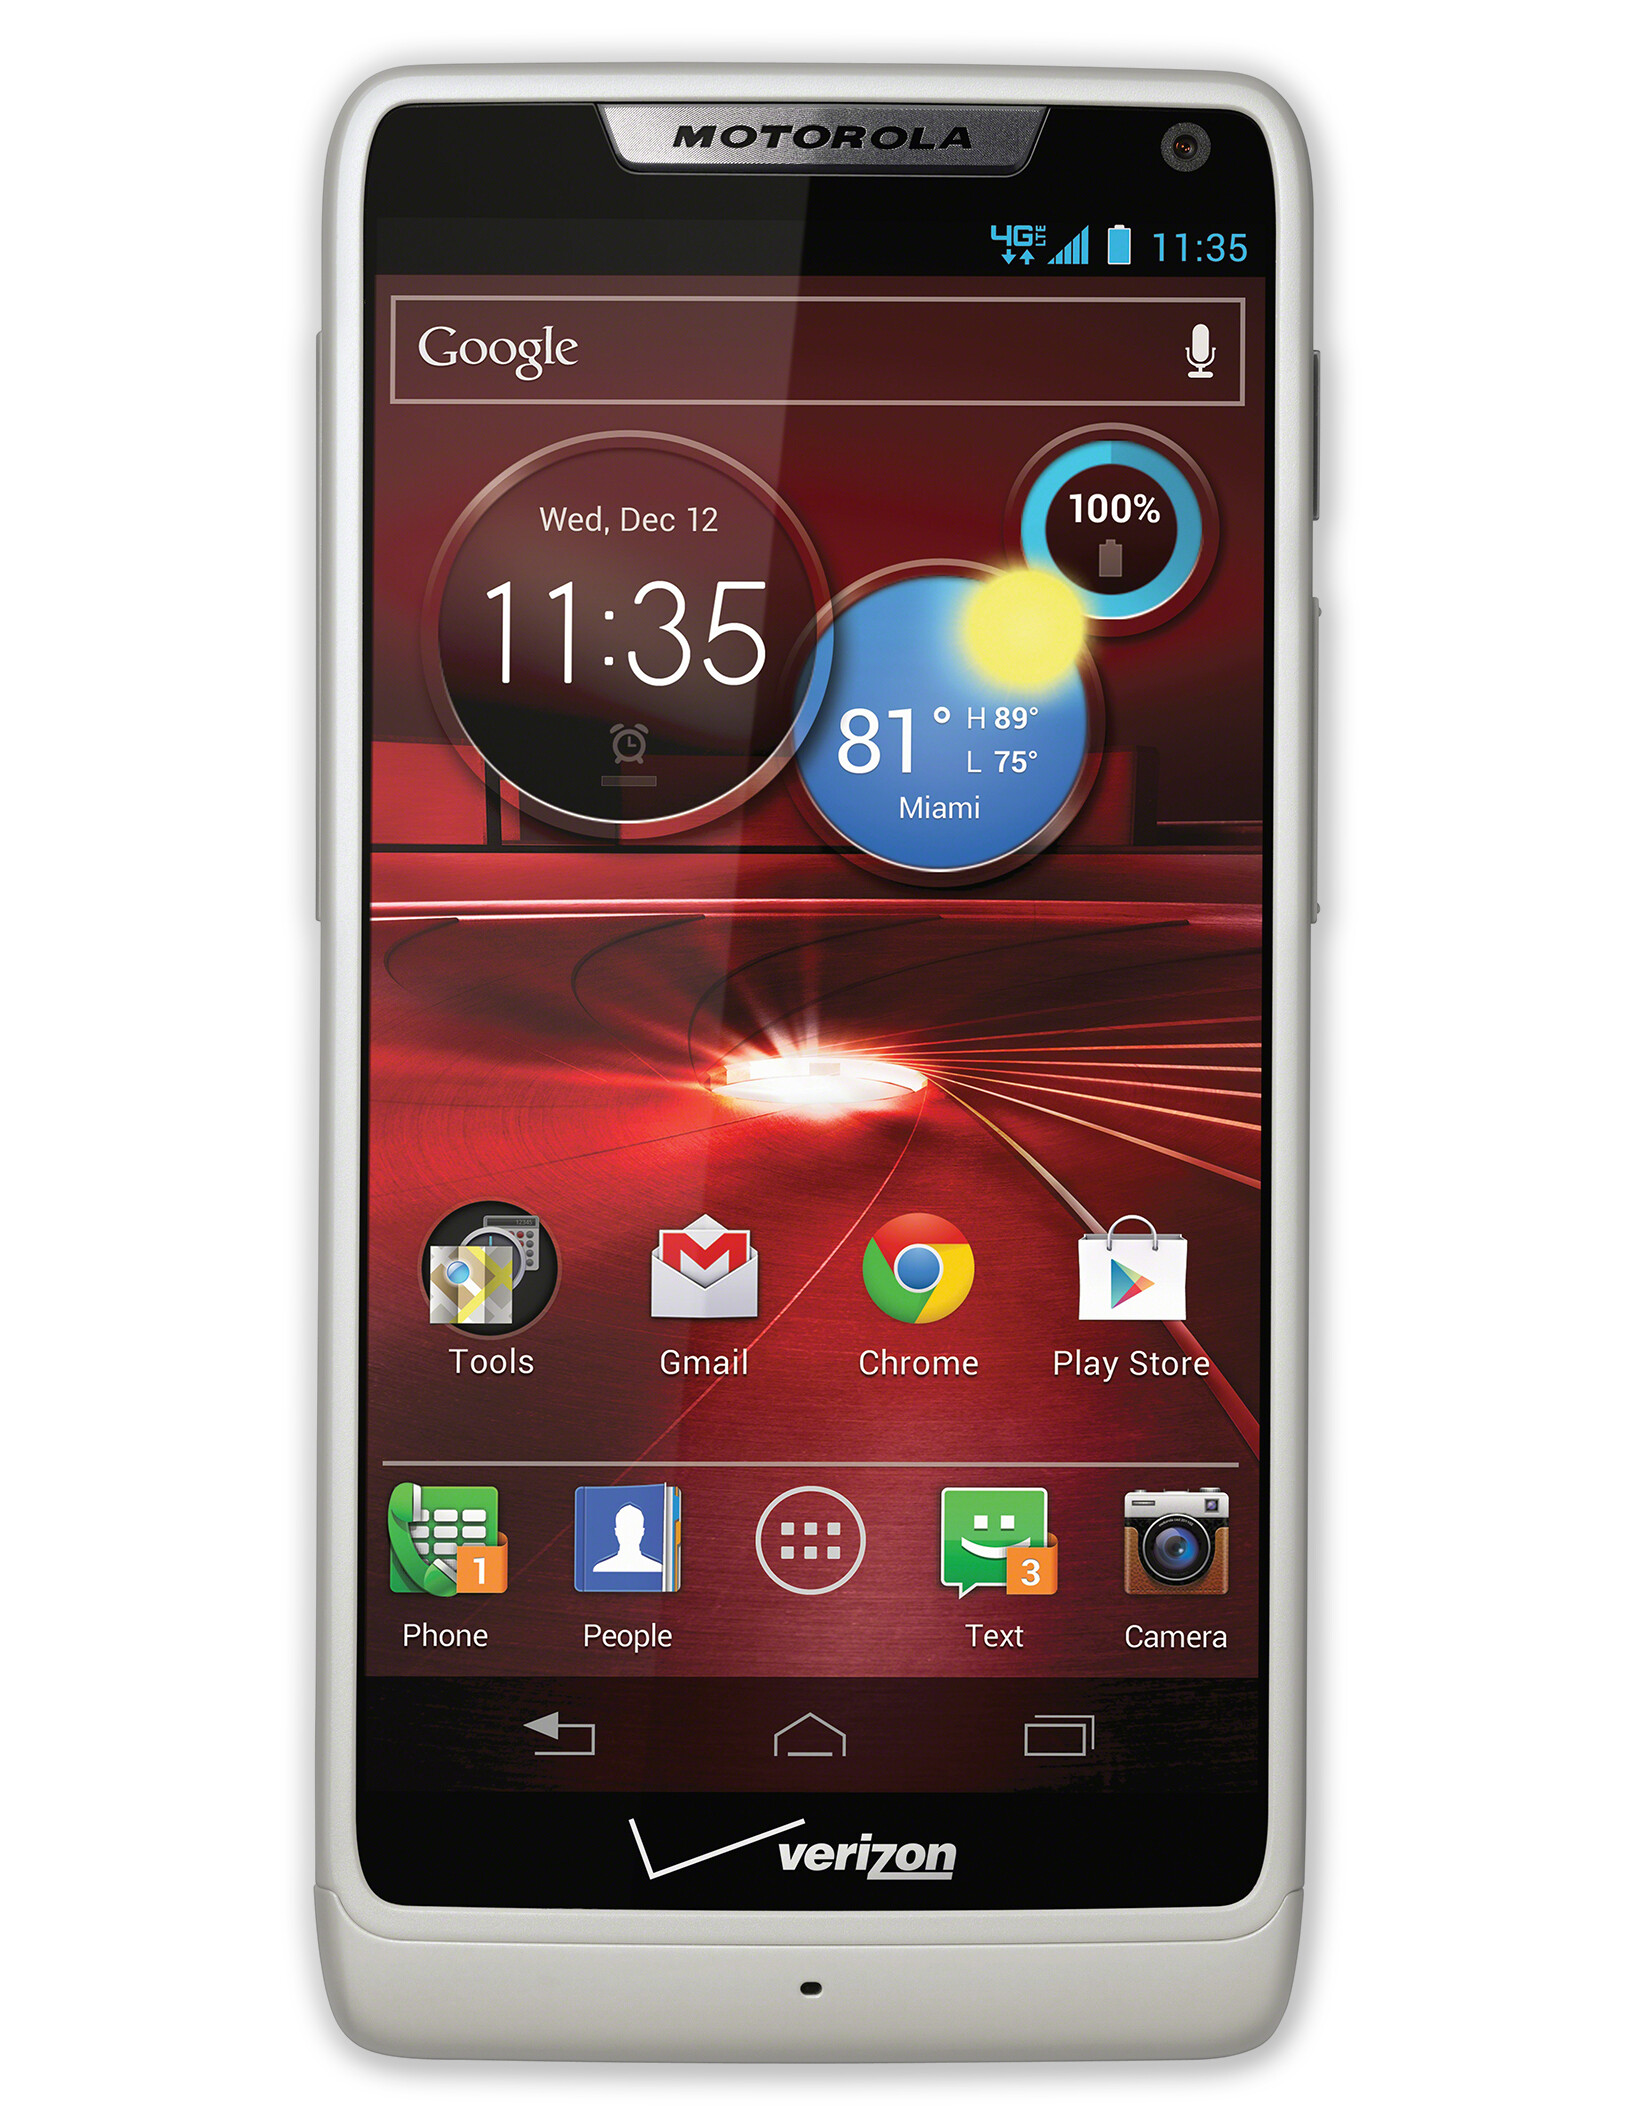 Electronic Motorola Android Smart Phone motorola droid razr m specs m